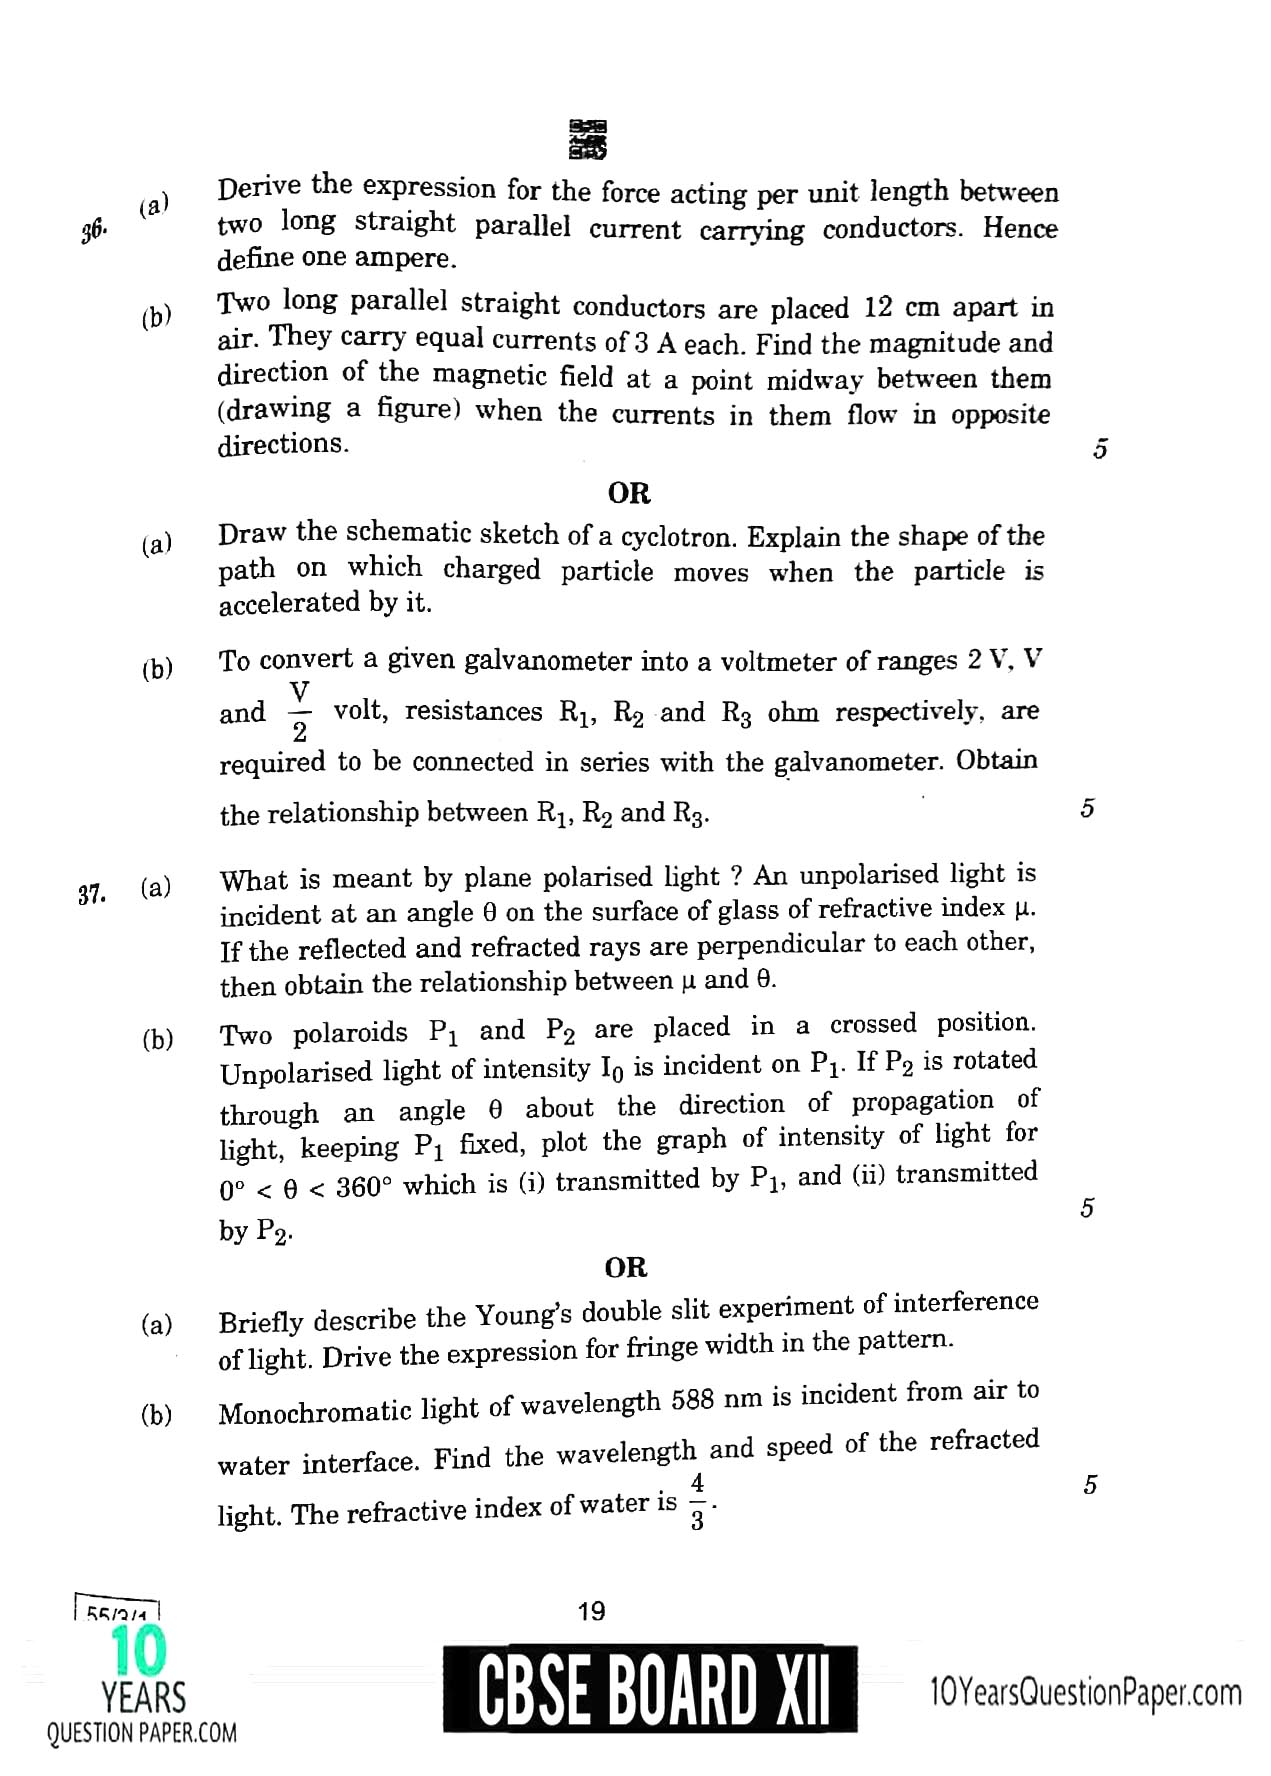 CBSE Class 12 Physics 2020 Question Paper 09